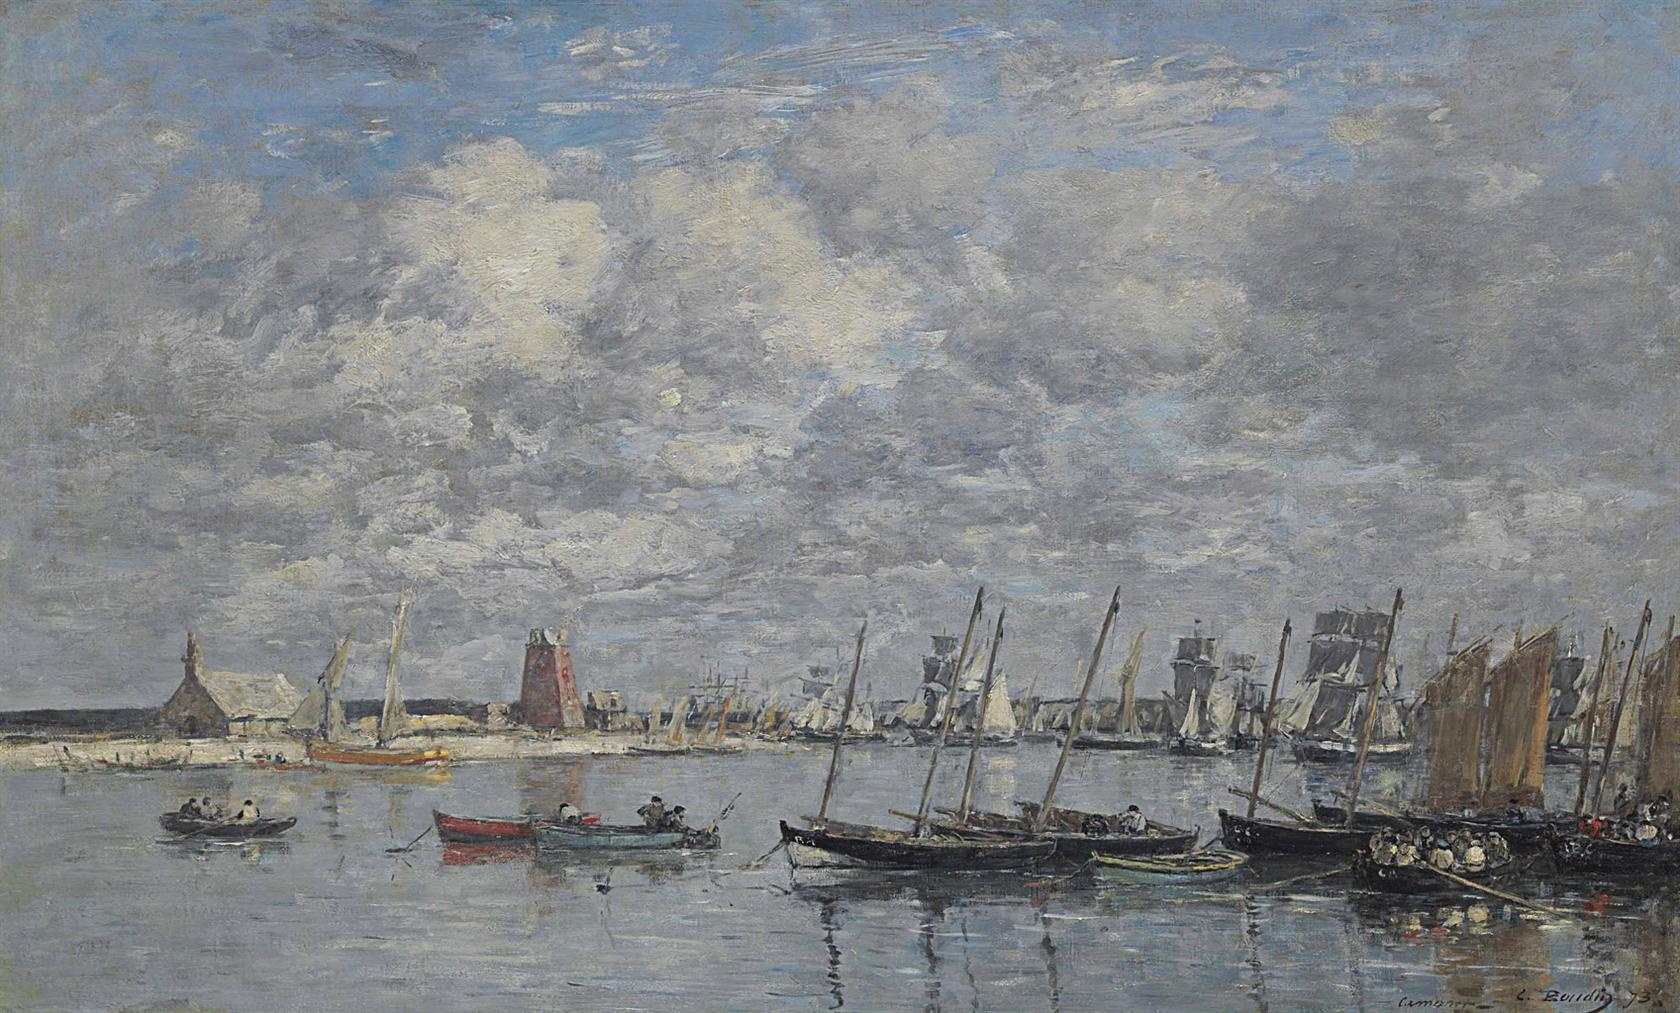 Eugene Louis Boudin-Camaret, Le Port-1873